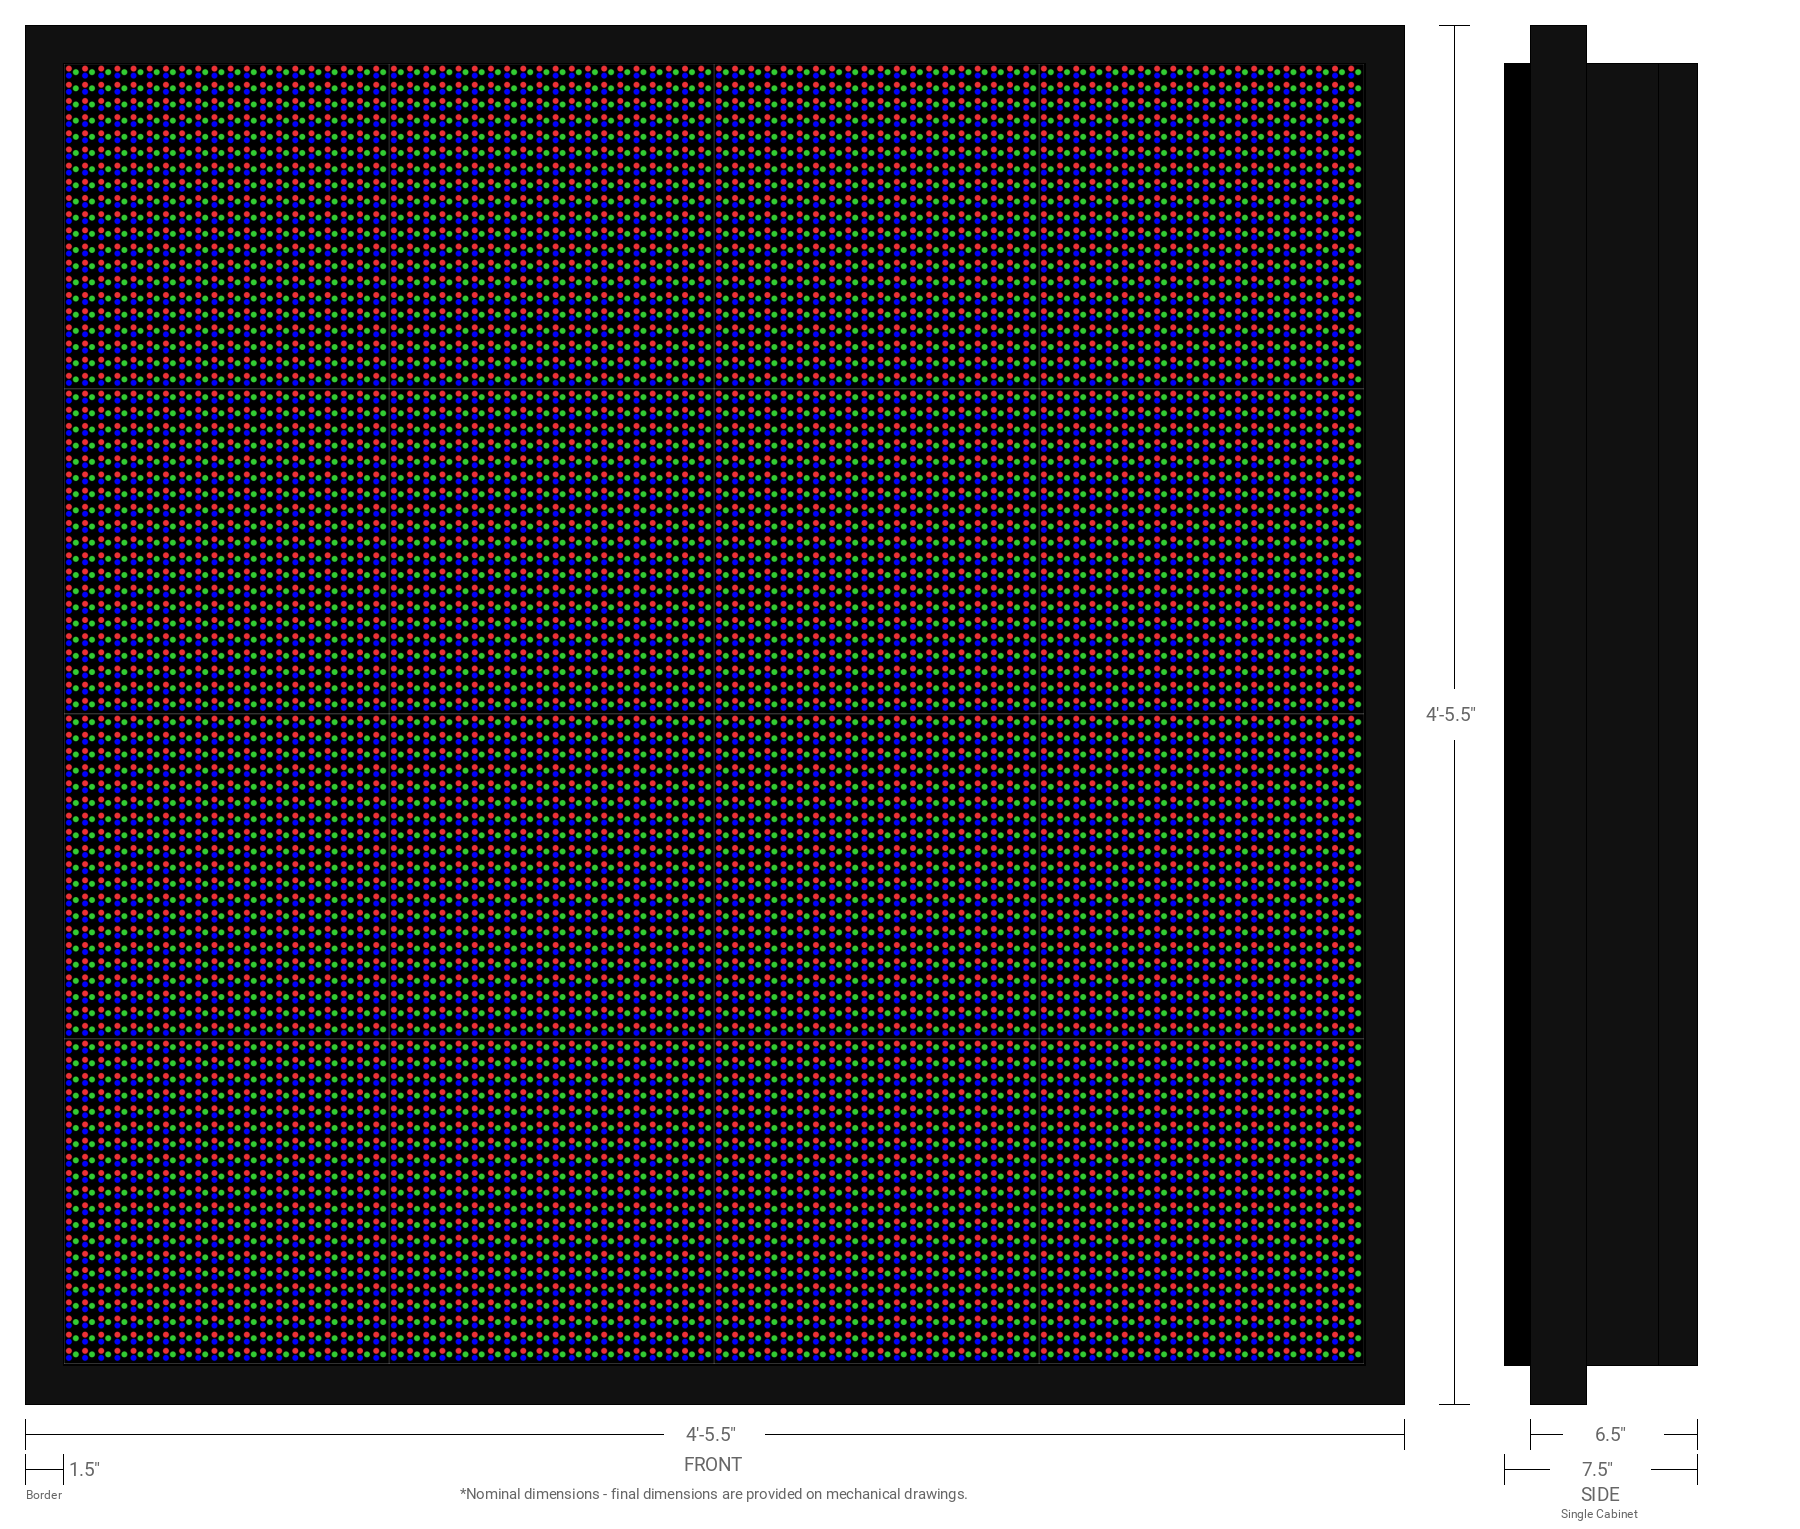 Aurora 16mm 80x80 Single Sided Full Color LED Display